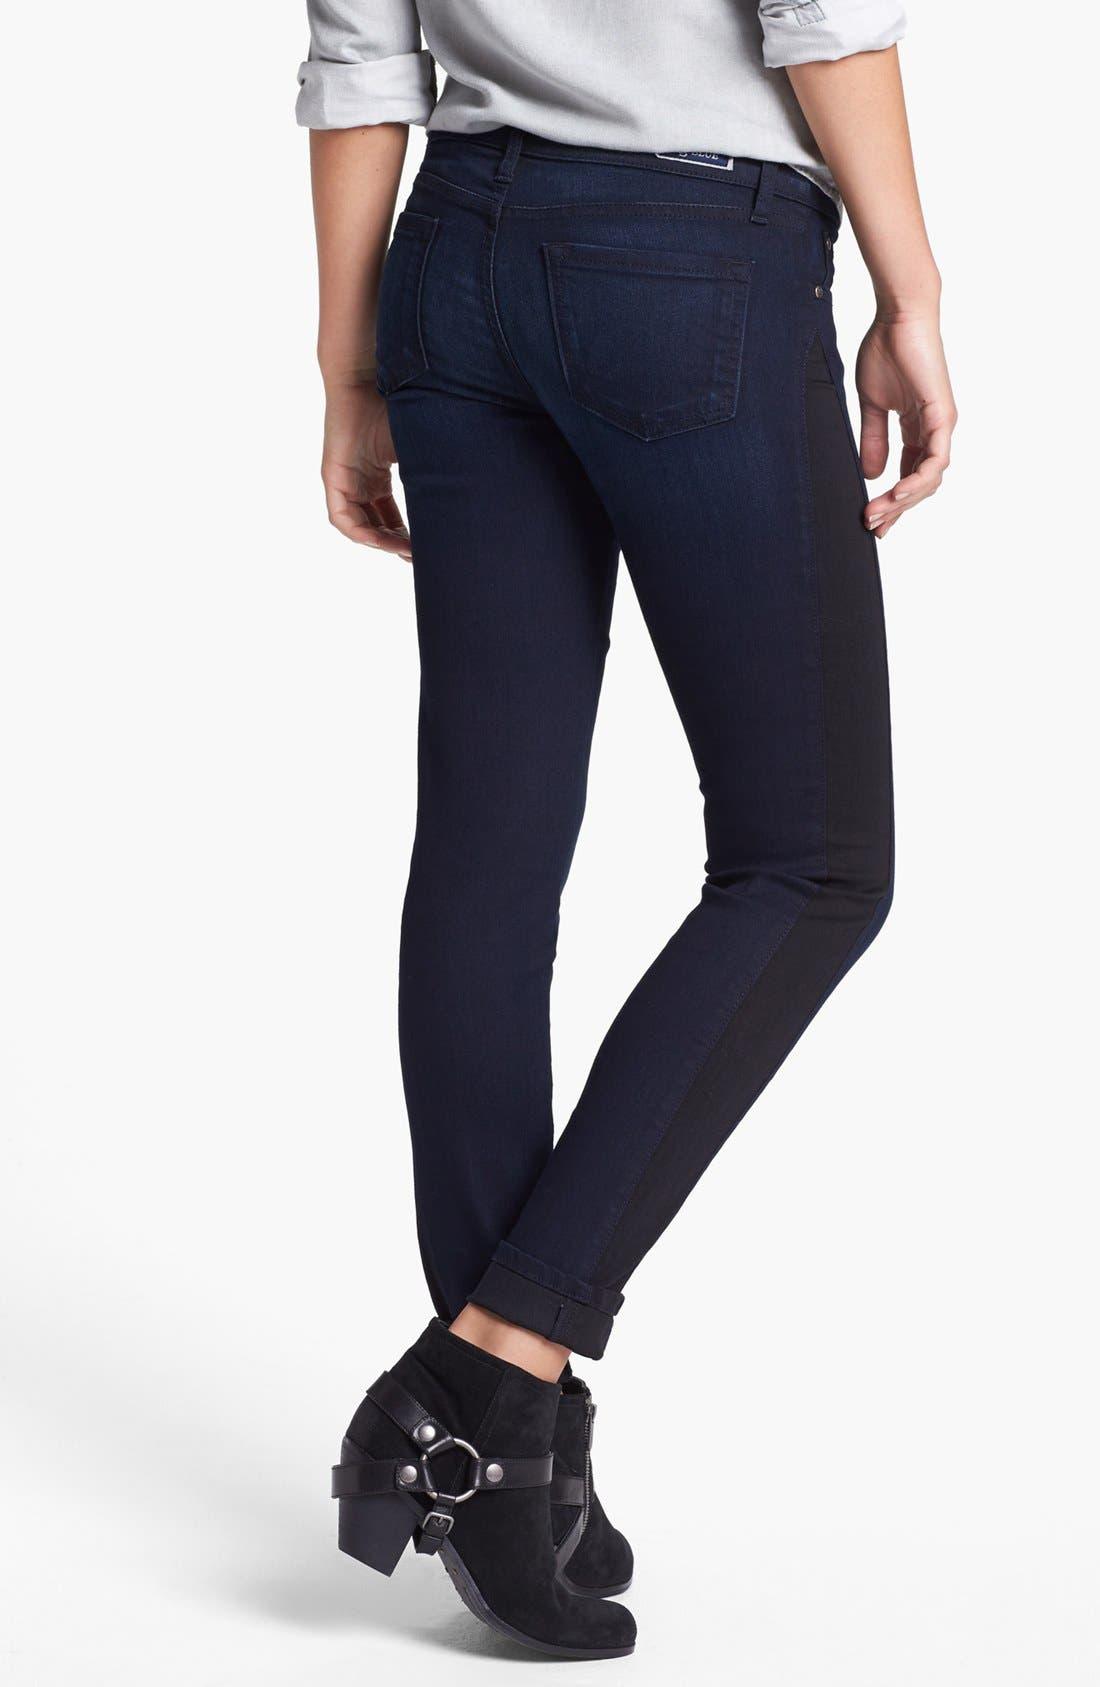 Alternate Image 1 Selected - STS Blue Tuxedo Stripe Skinny Jeans (Medium) (Juniors)